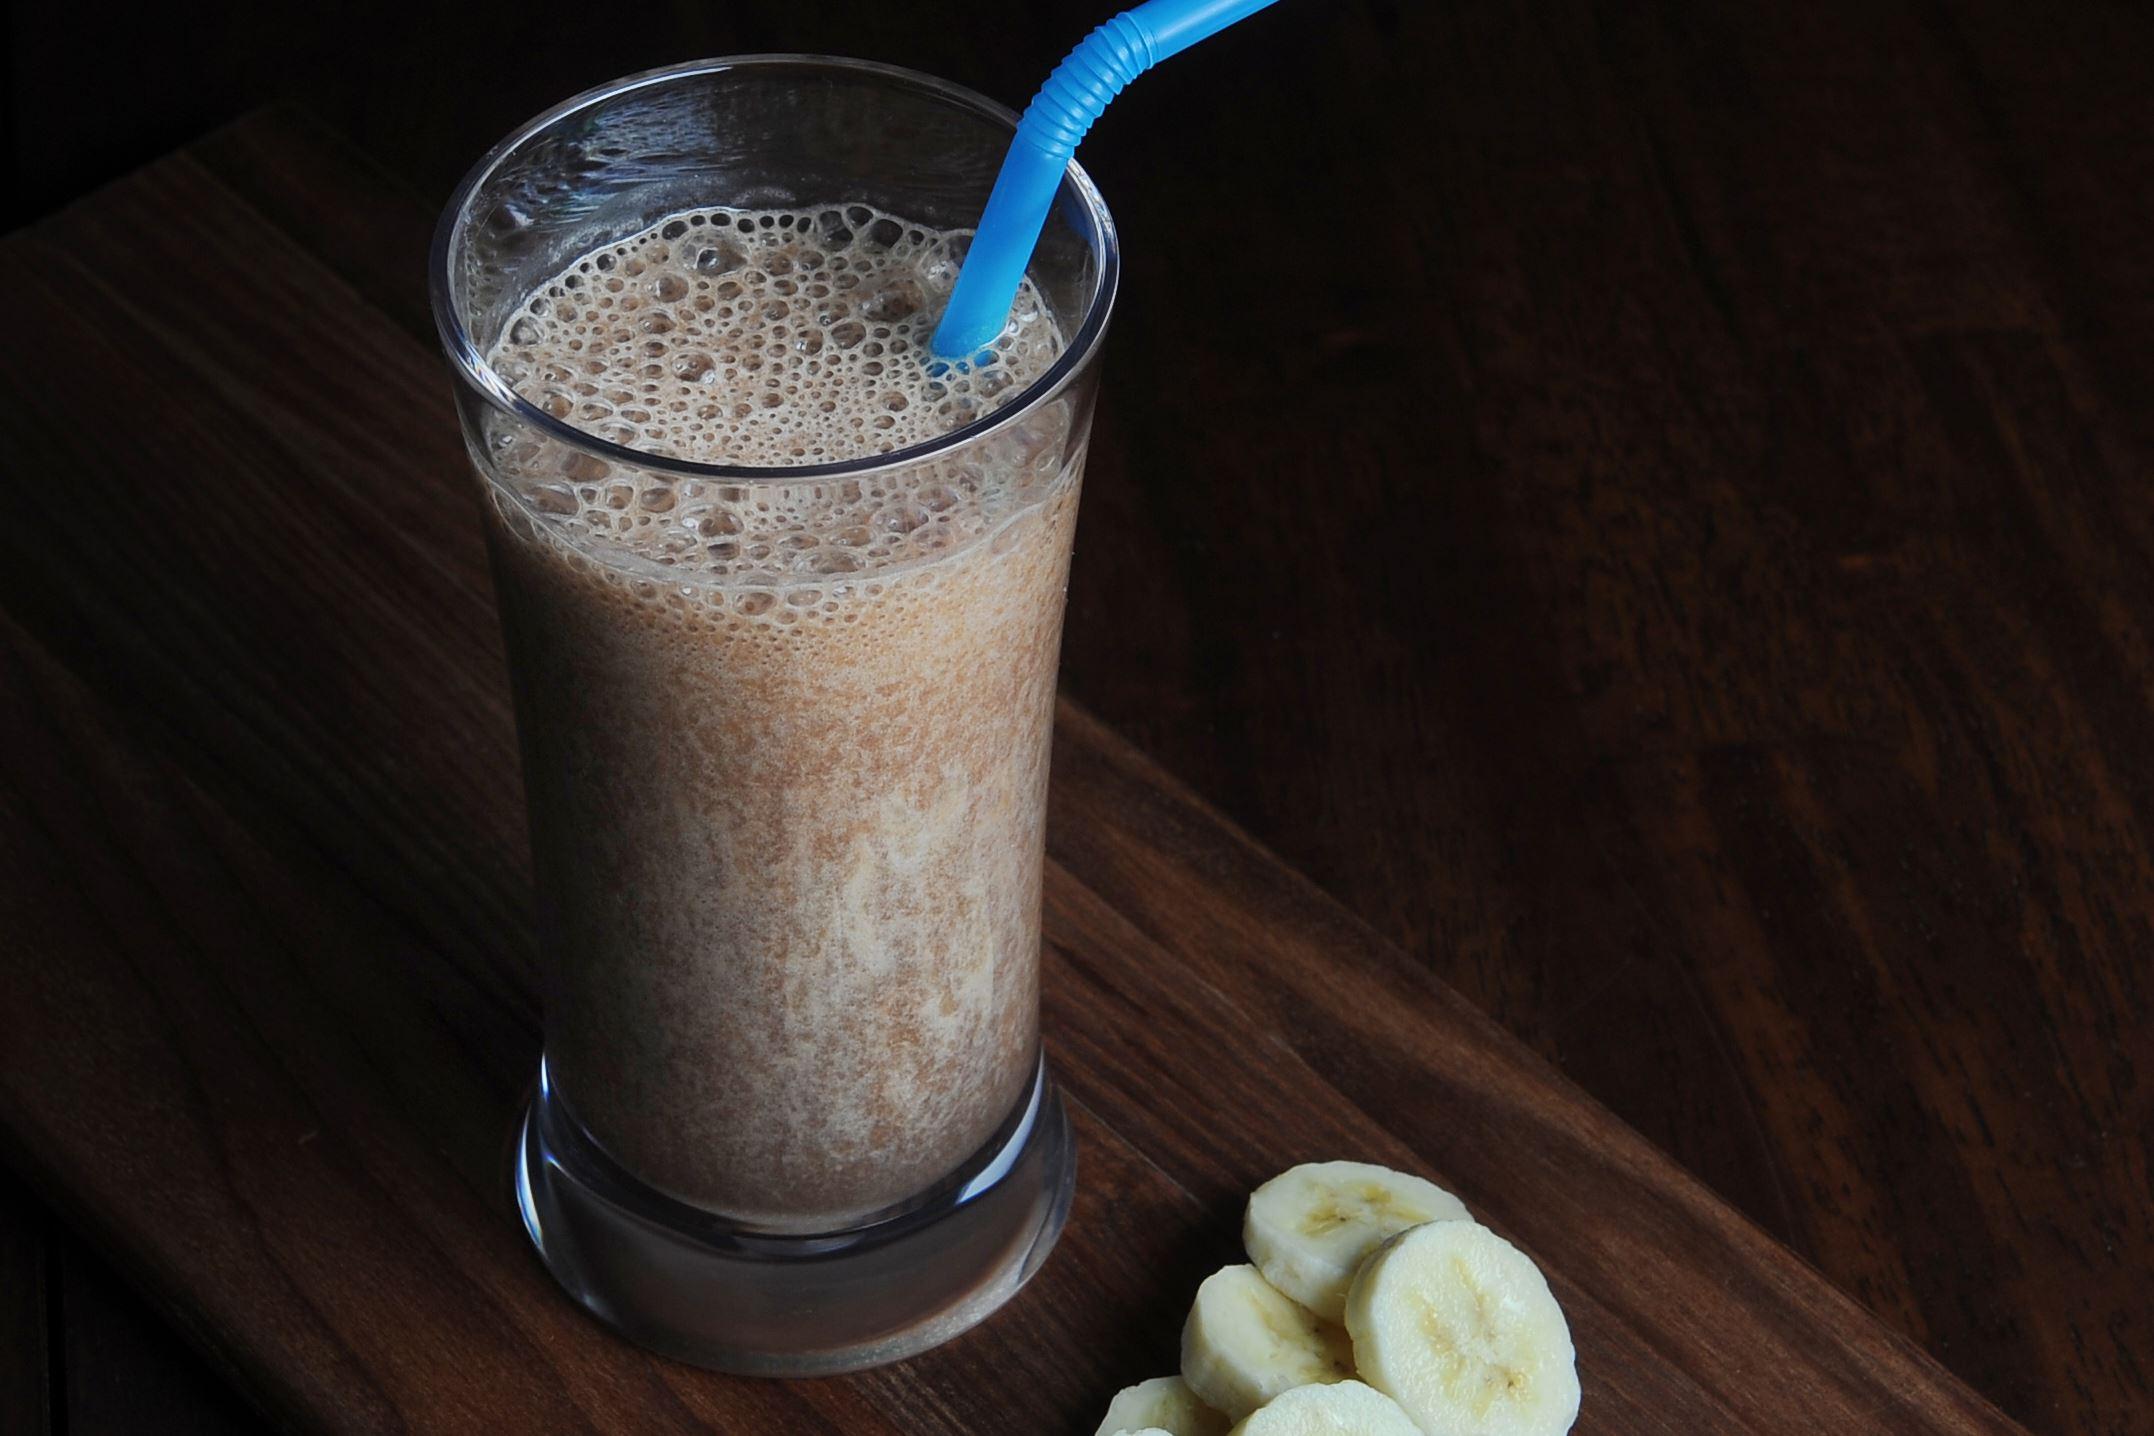 20160407ng-Smoothie7-2 A chocolate-banana smoothie.